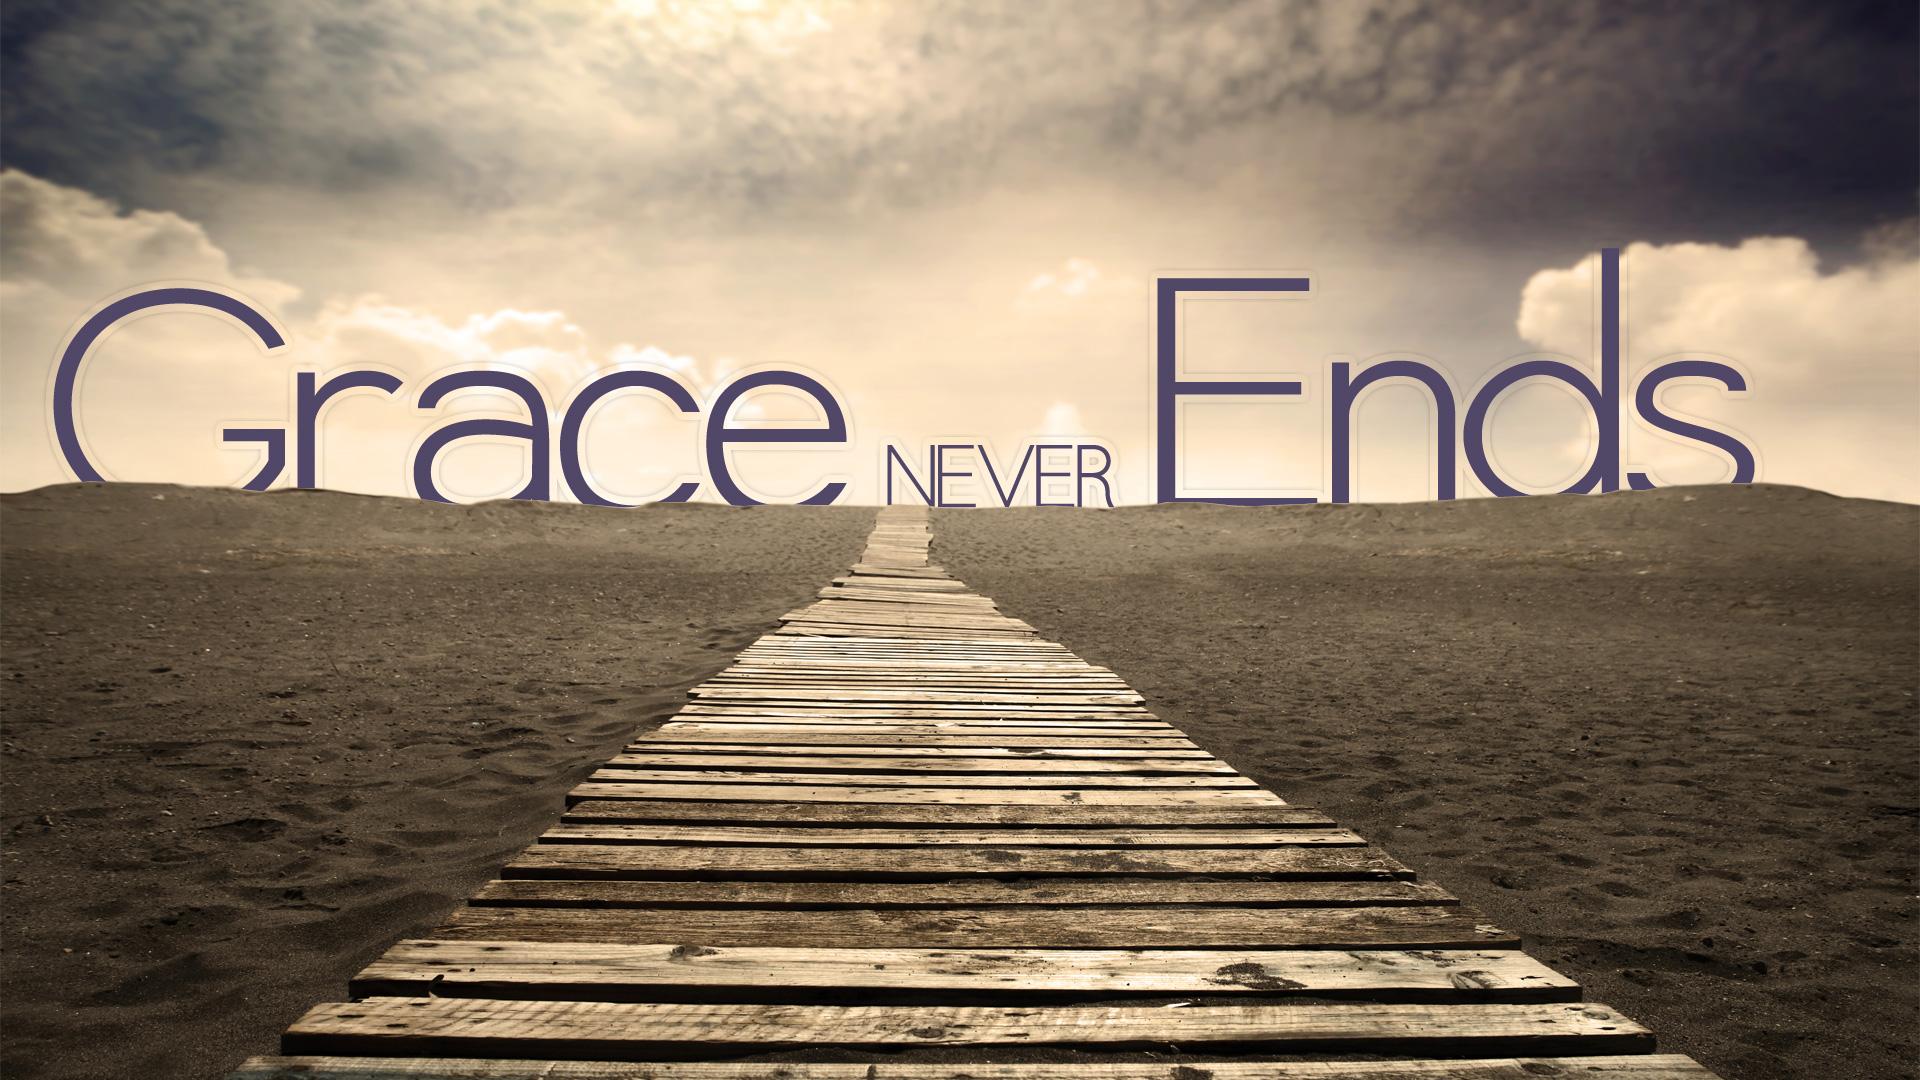 GraceNeverEnds-Image1